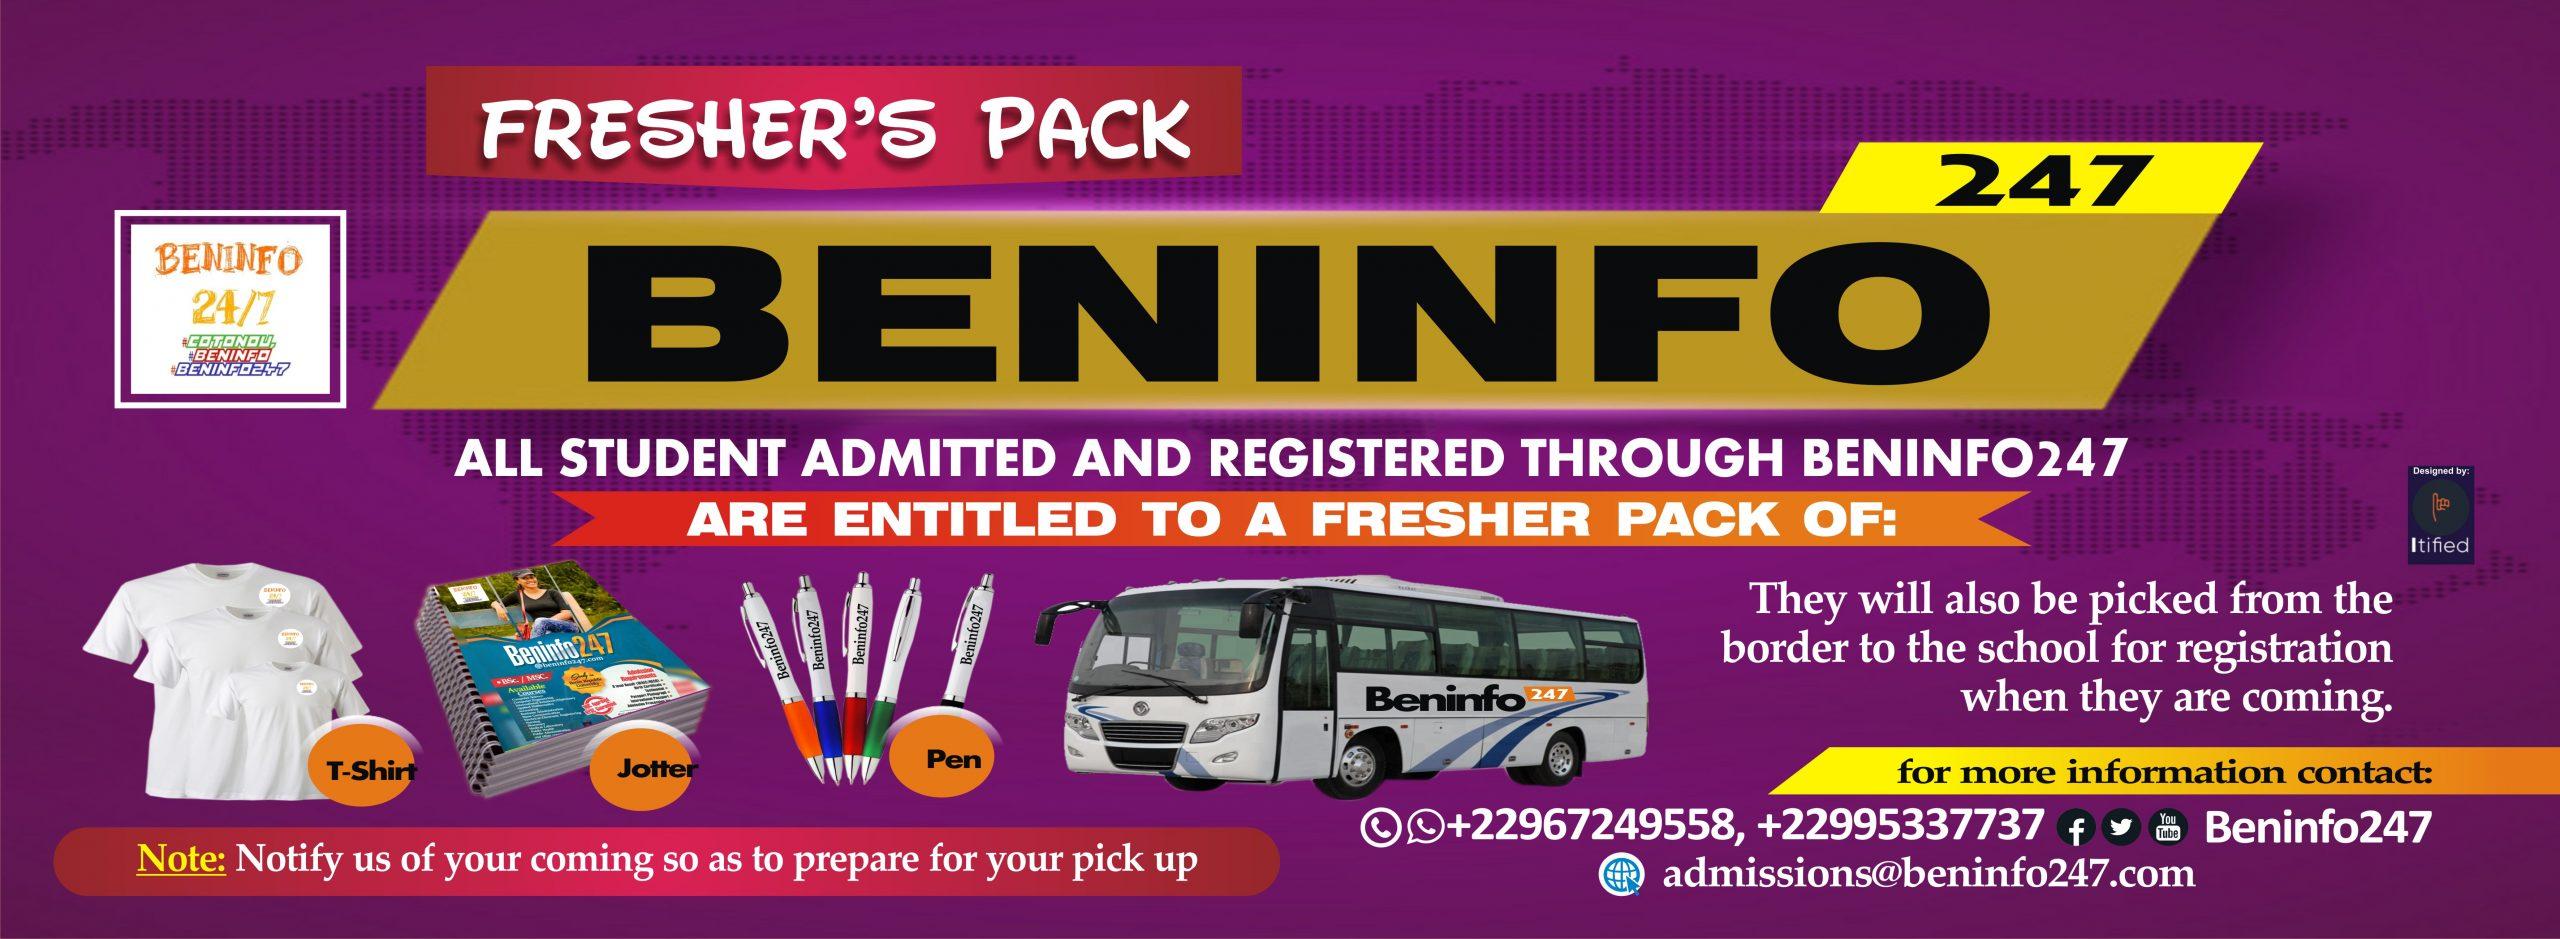 Beninfo pack X3